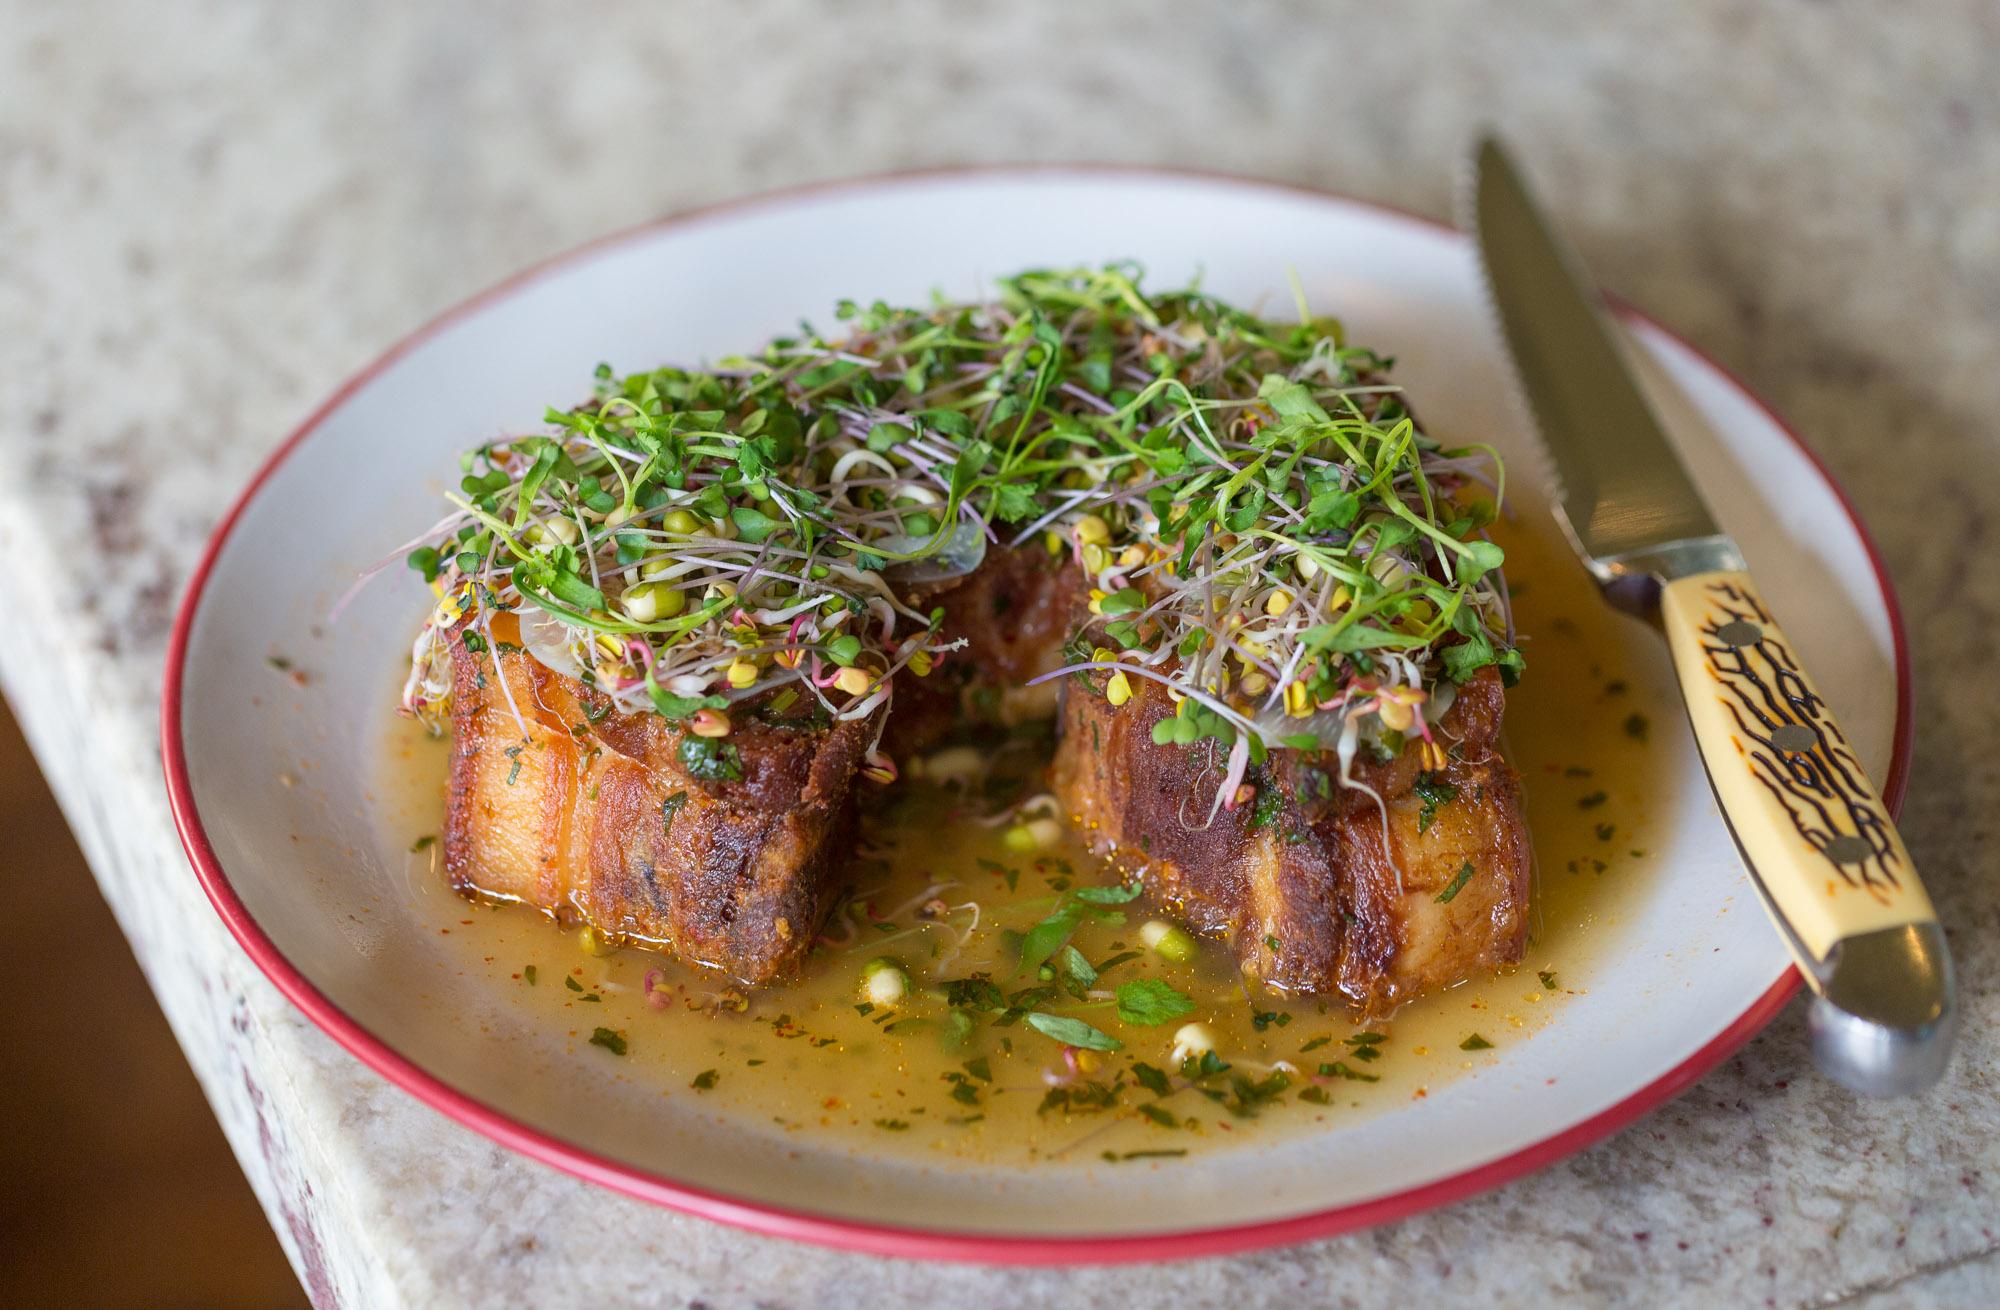 The famed chicharron porchetta dish from Broken Spanish in Los Angeles.